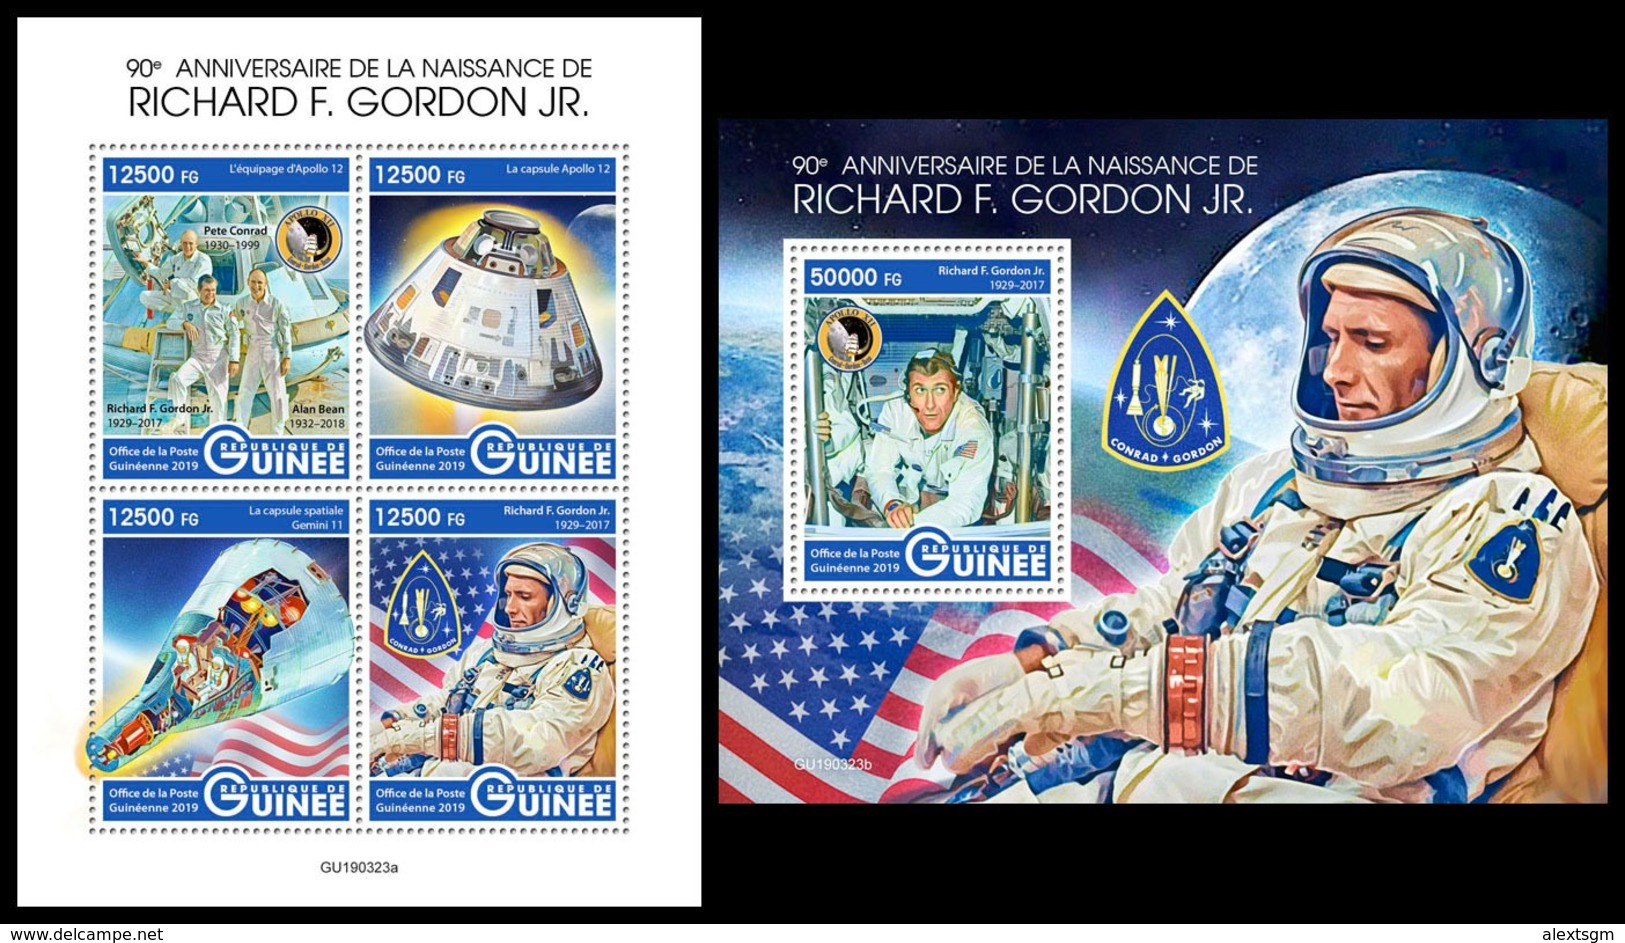 GUINEA 2019 - R. Gordon, Space. M/S + S/S. Official Issue [GU190323] - Space